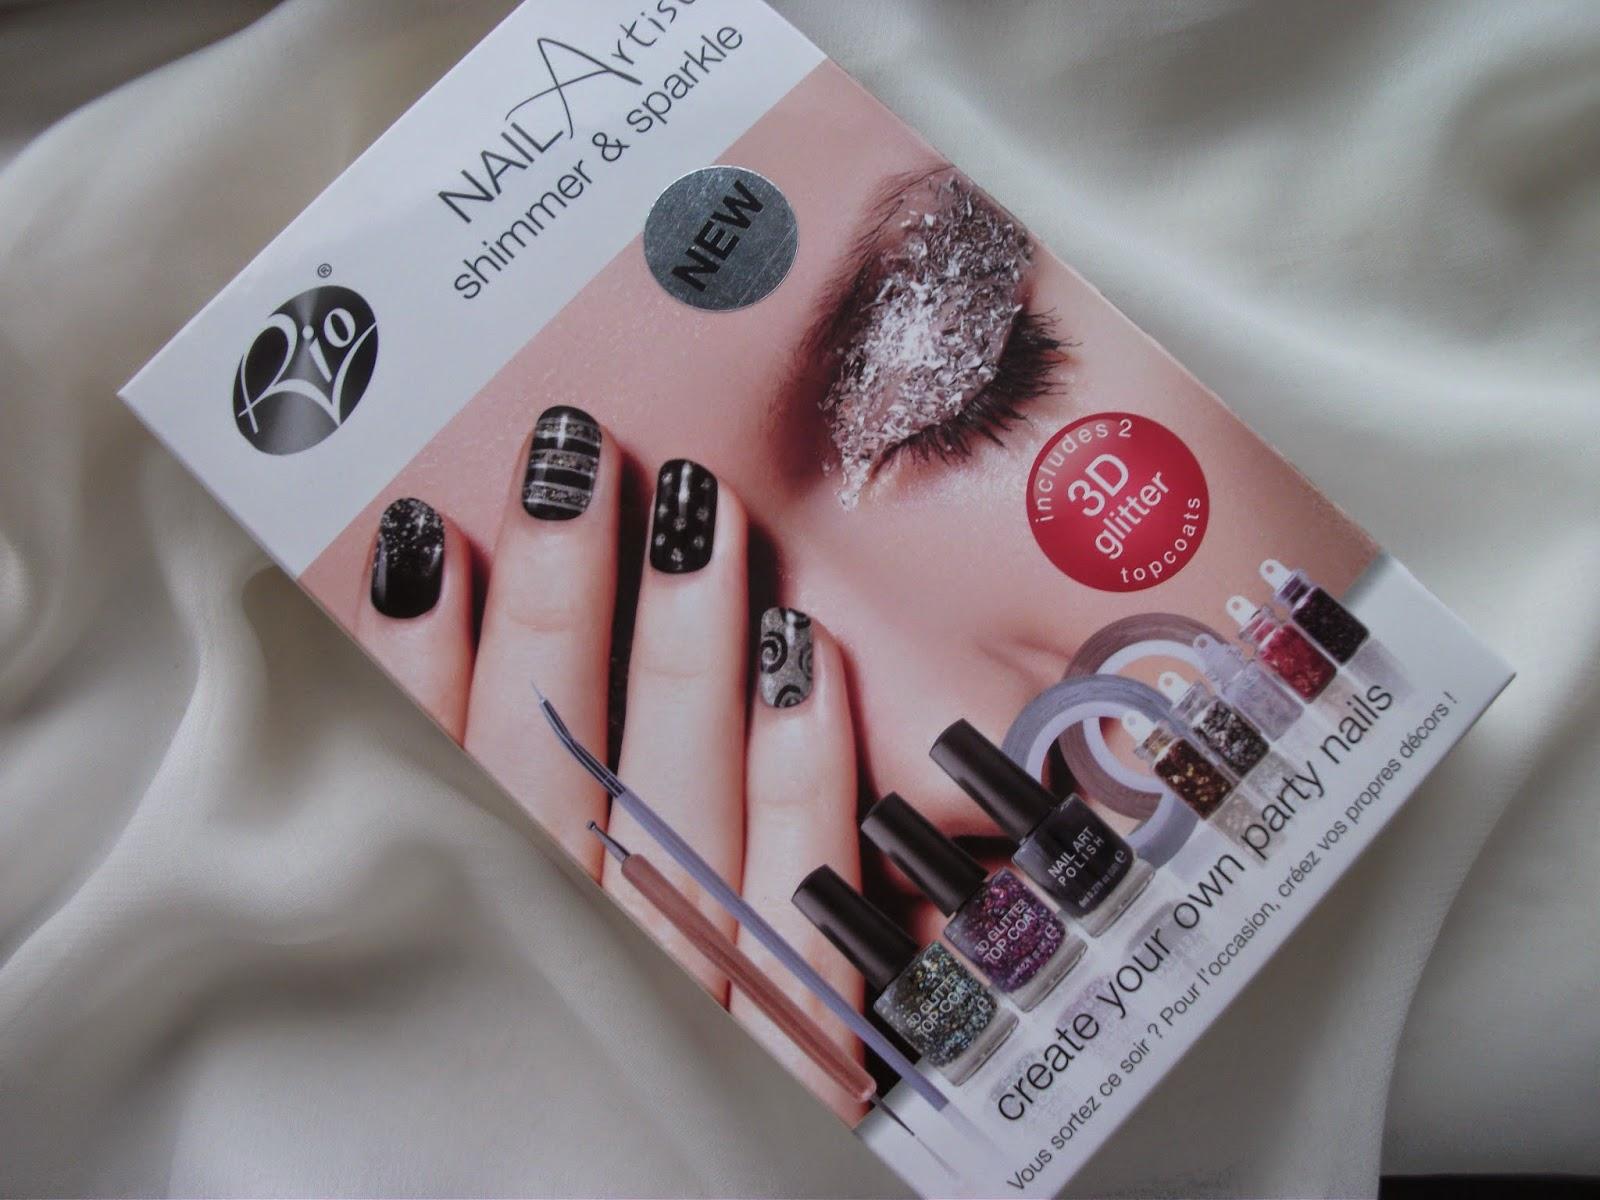 Rio Nail Artist Shimmer & Sparkle